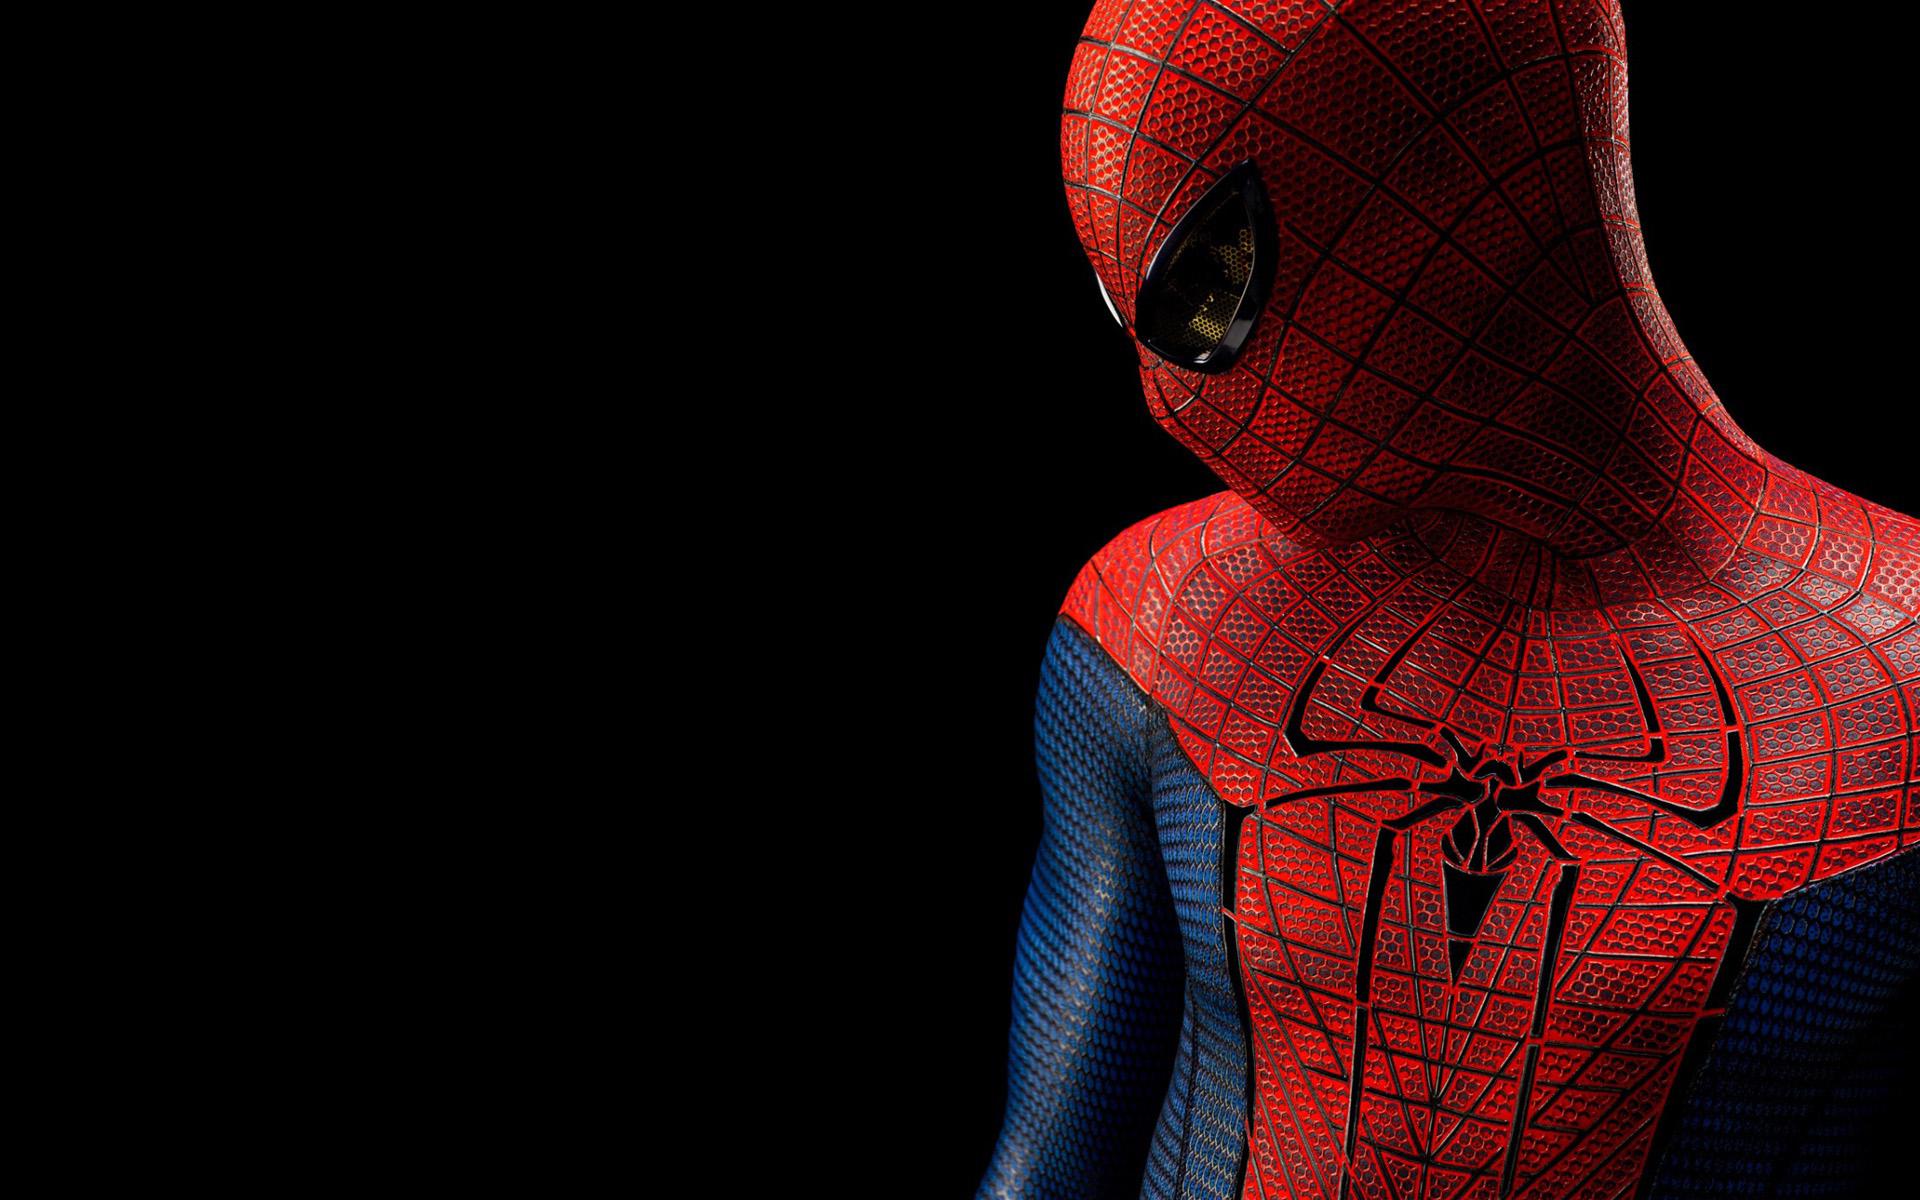 The Amazing Spider Man 2012 Wallpaper HDThe Amazing Spider Man 2012  1920x1200